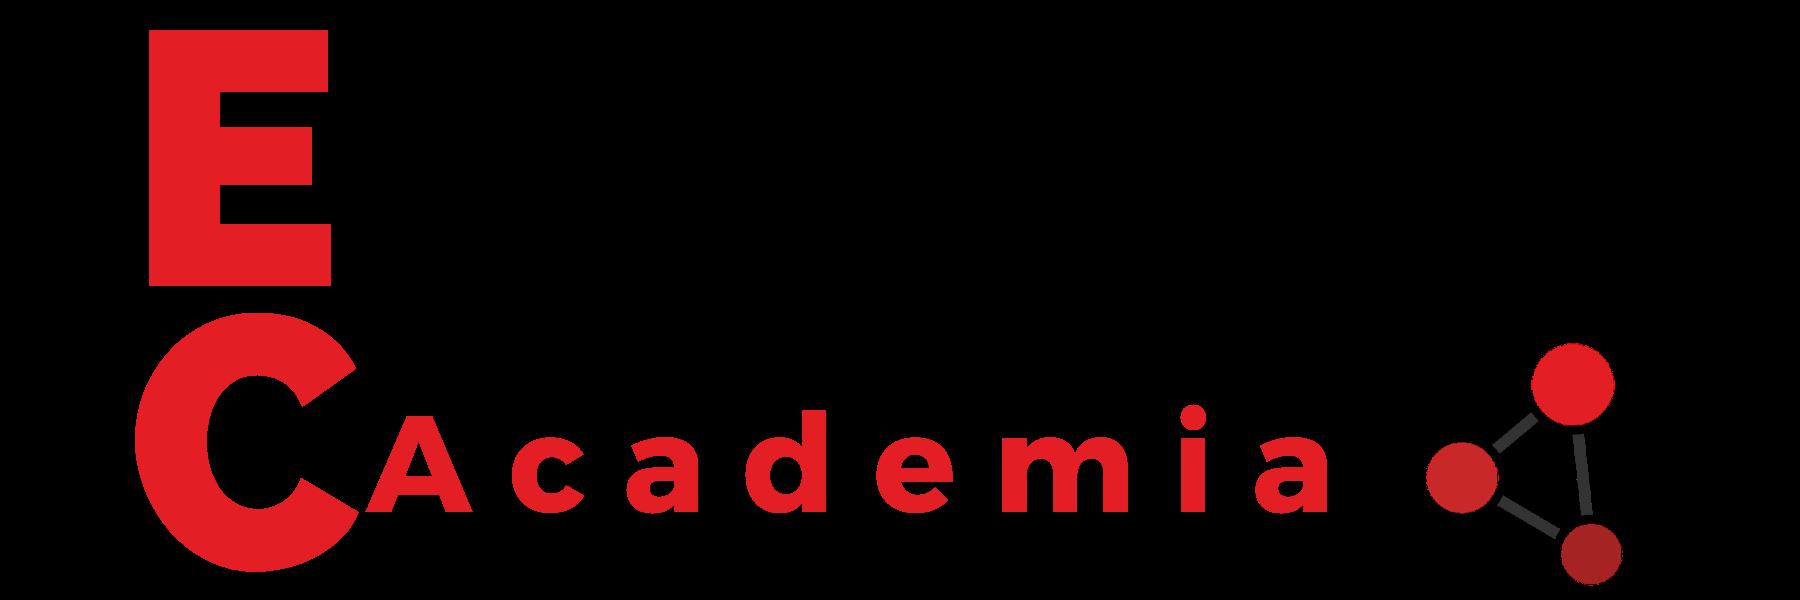 EC Academia